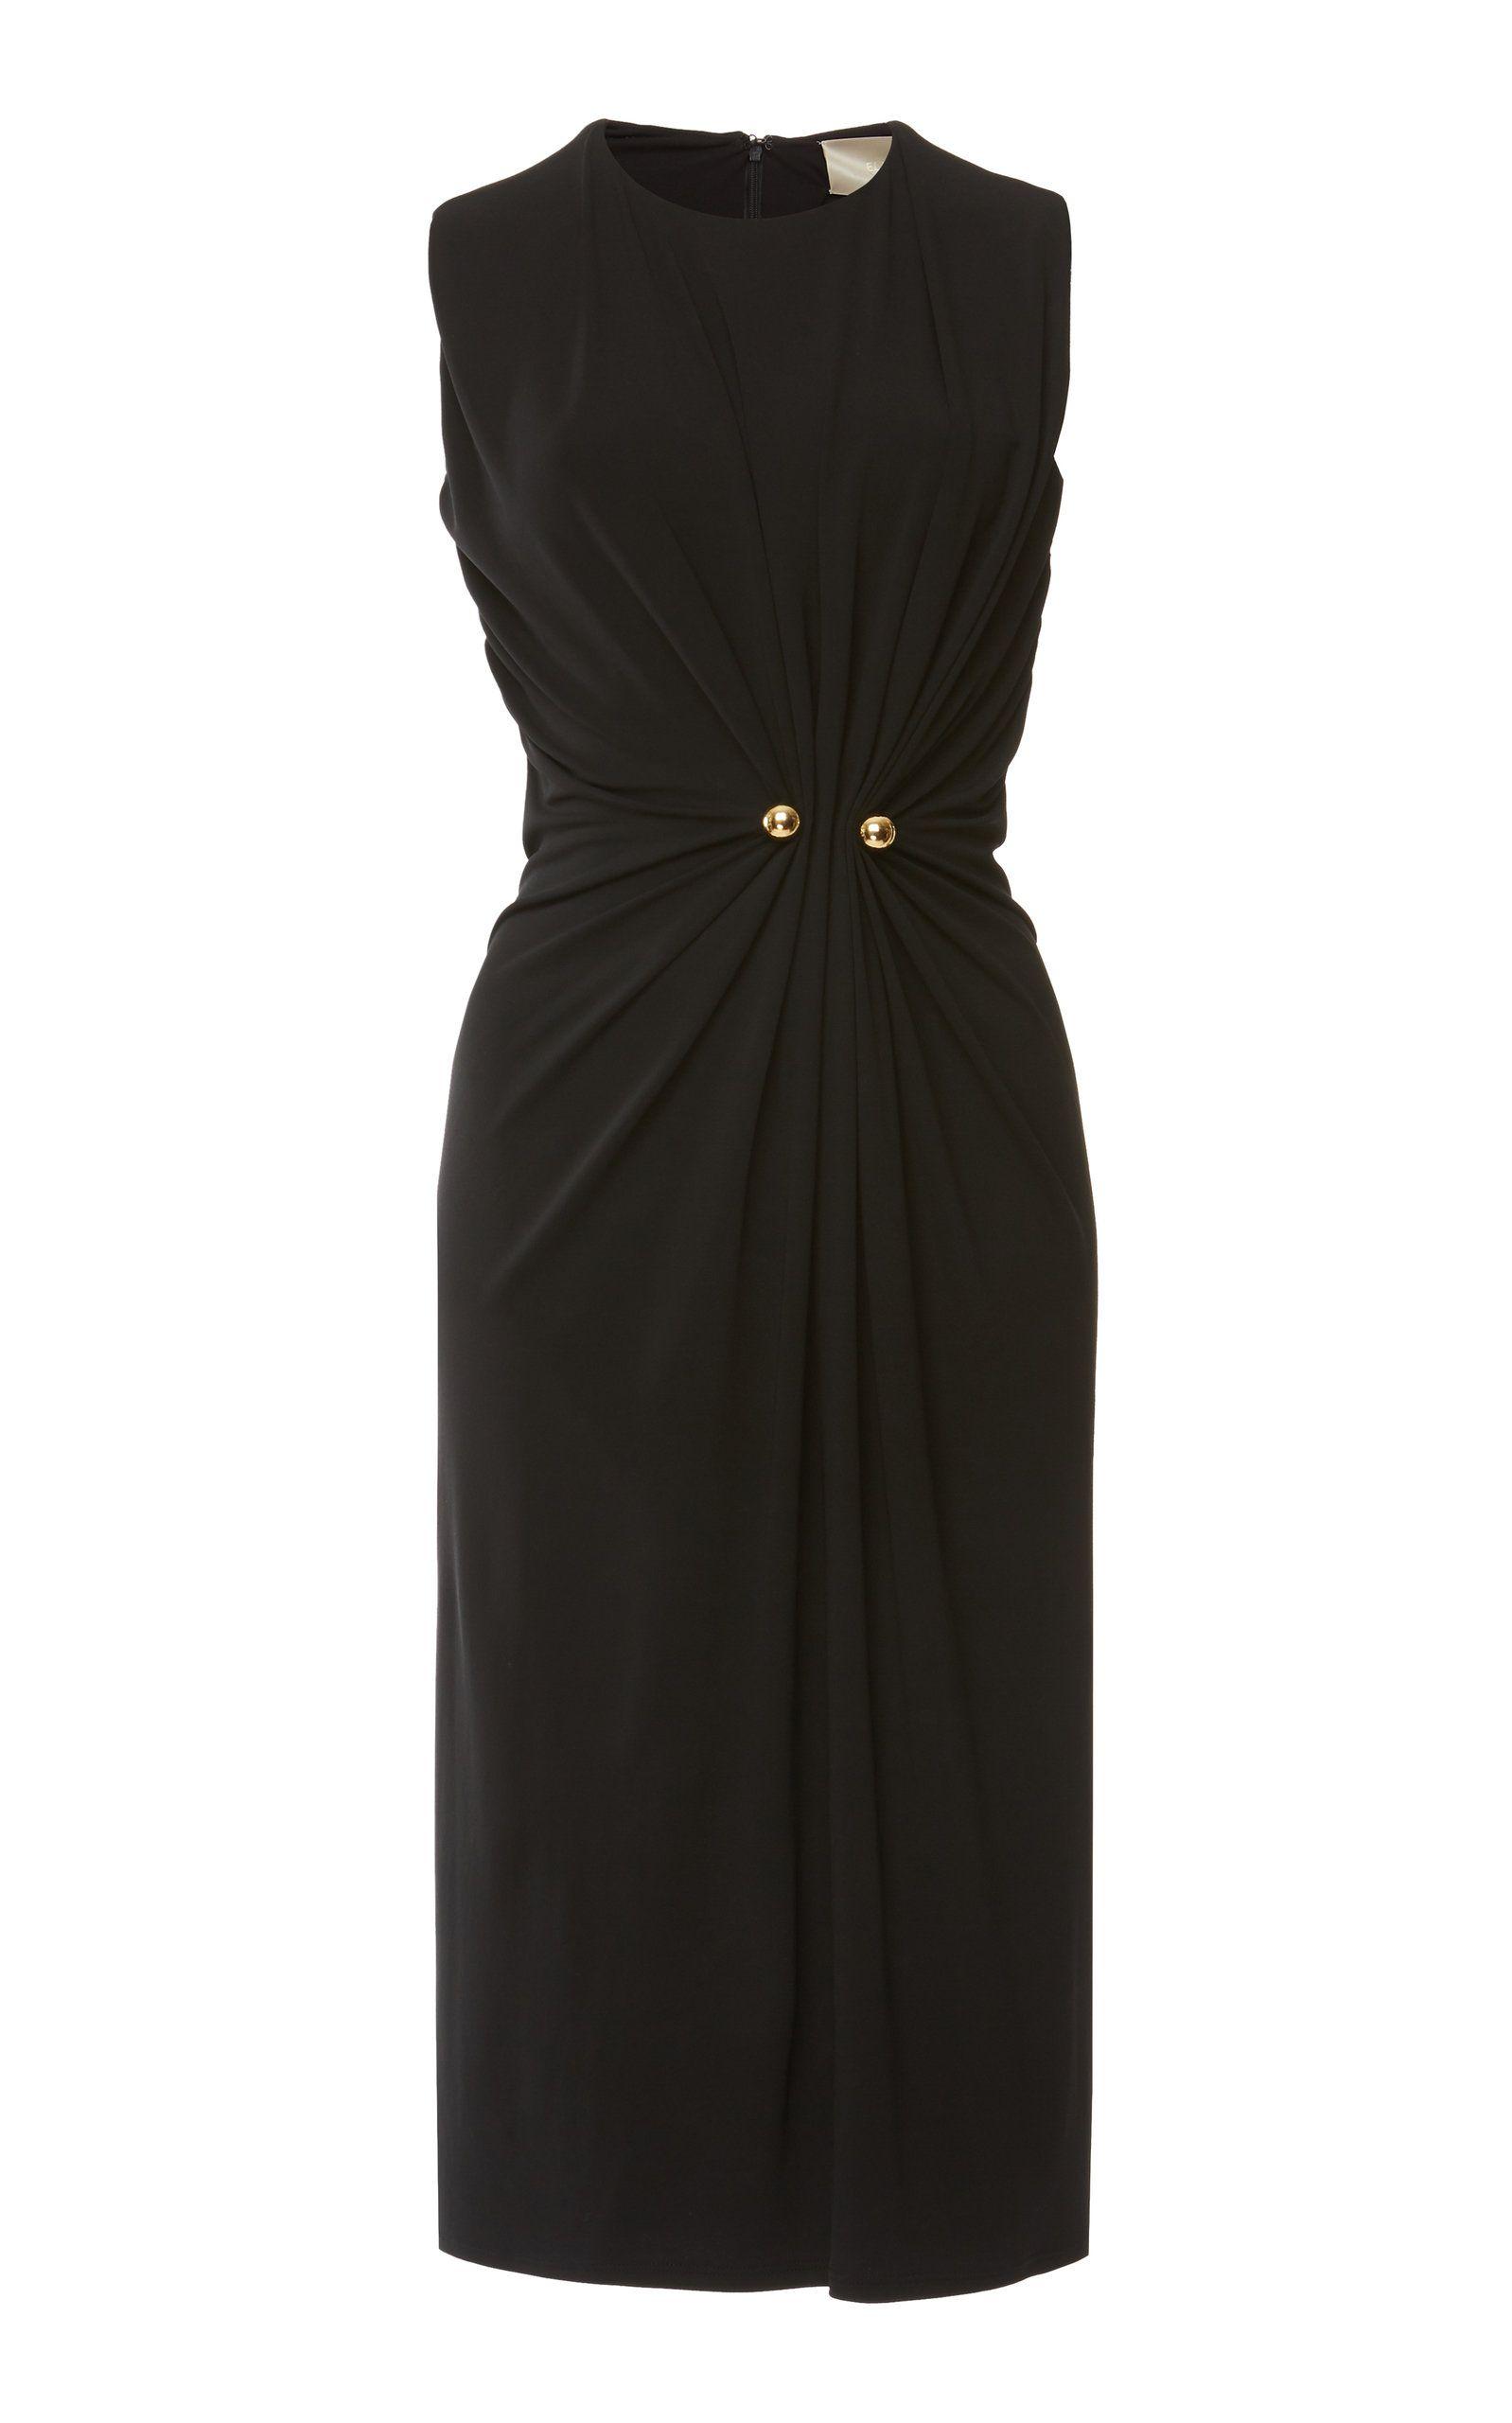 081d3b92b293 Sleeveless Draped Jersey Dress by ELIE SAAB for Preorder on Moda Operandi